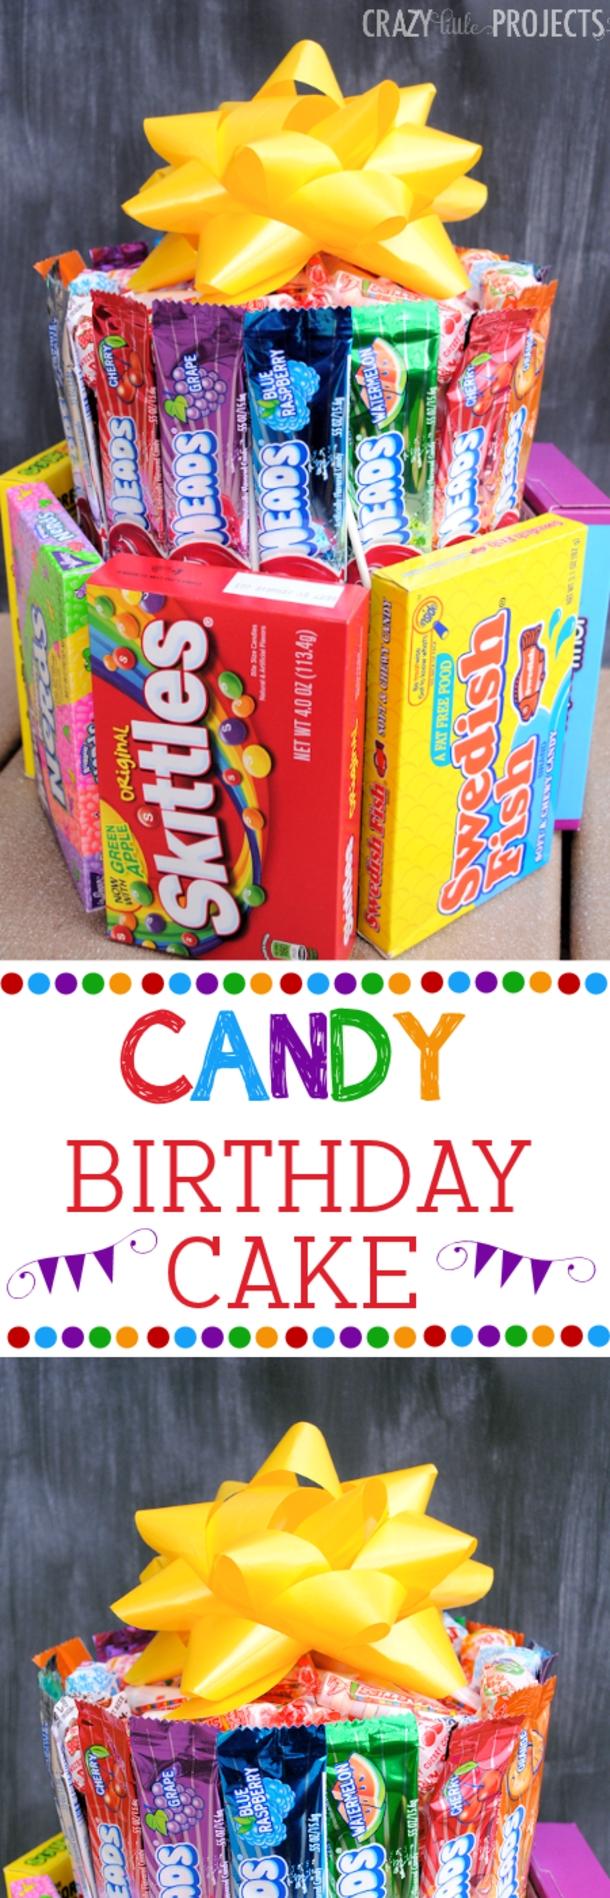 10 Ideal 16Th Birthday Gift Ideas For Boys 10 diy gifts for a girls sweet 16 sweet 16 sweet 16 gifts and gift 7 2020